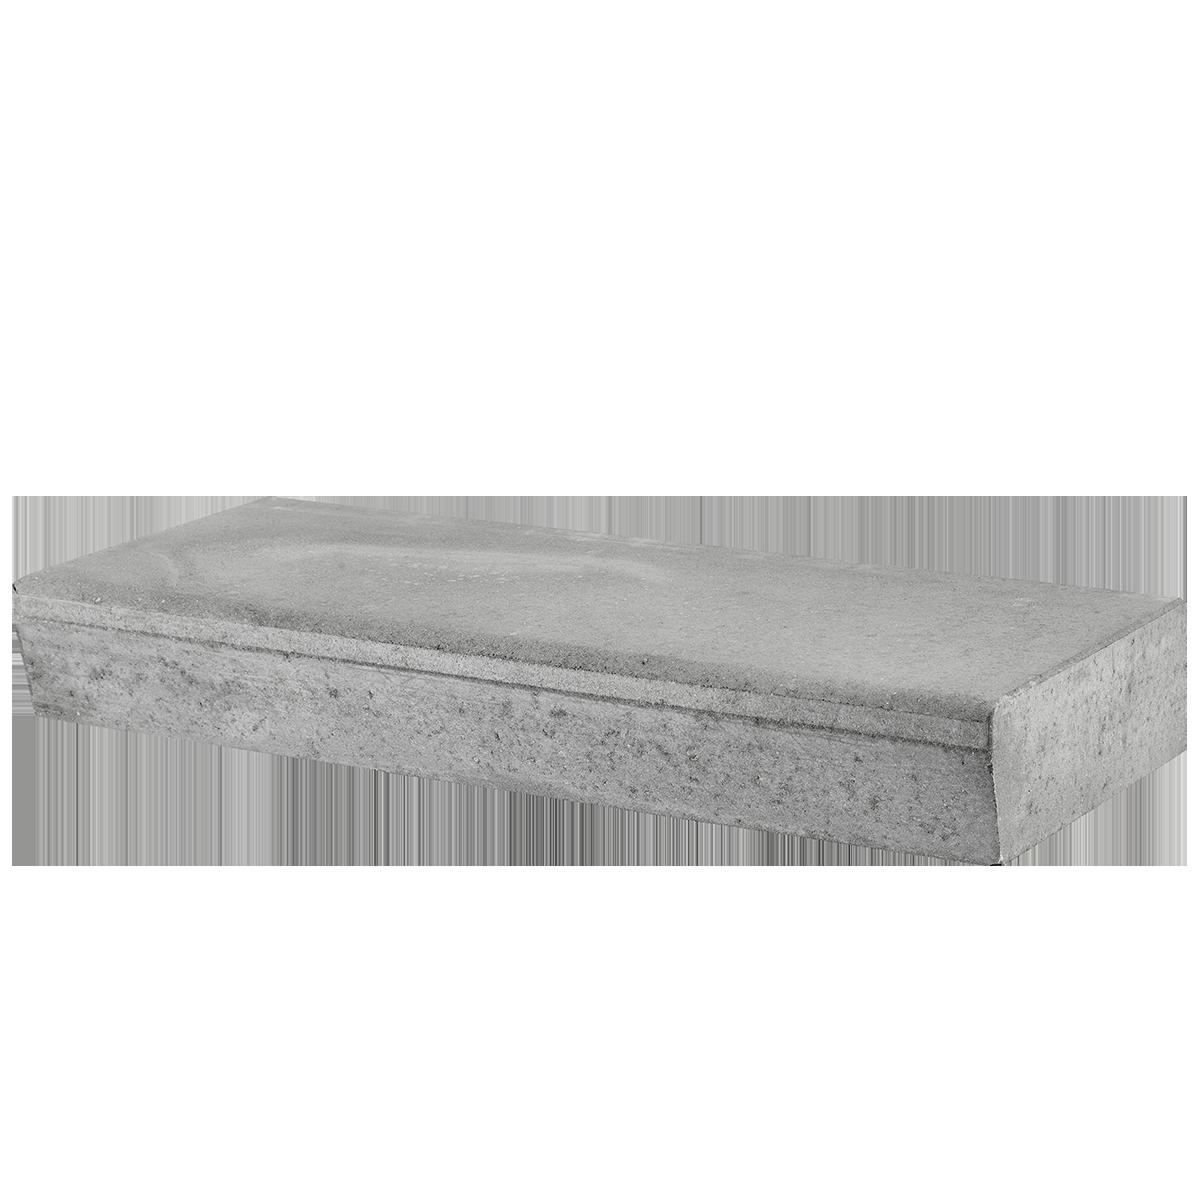 Trappetrin 100x40x14 cm Grå Skrå kant